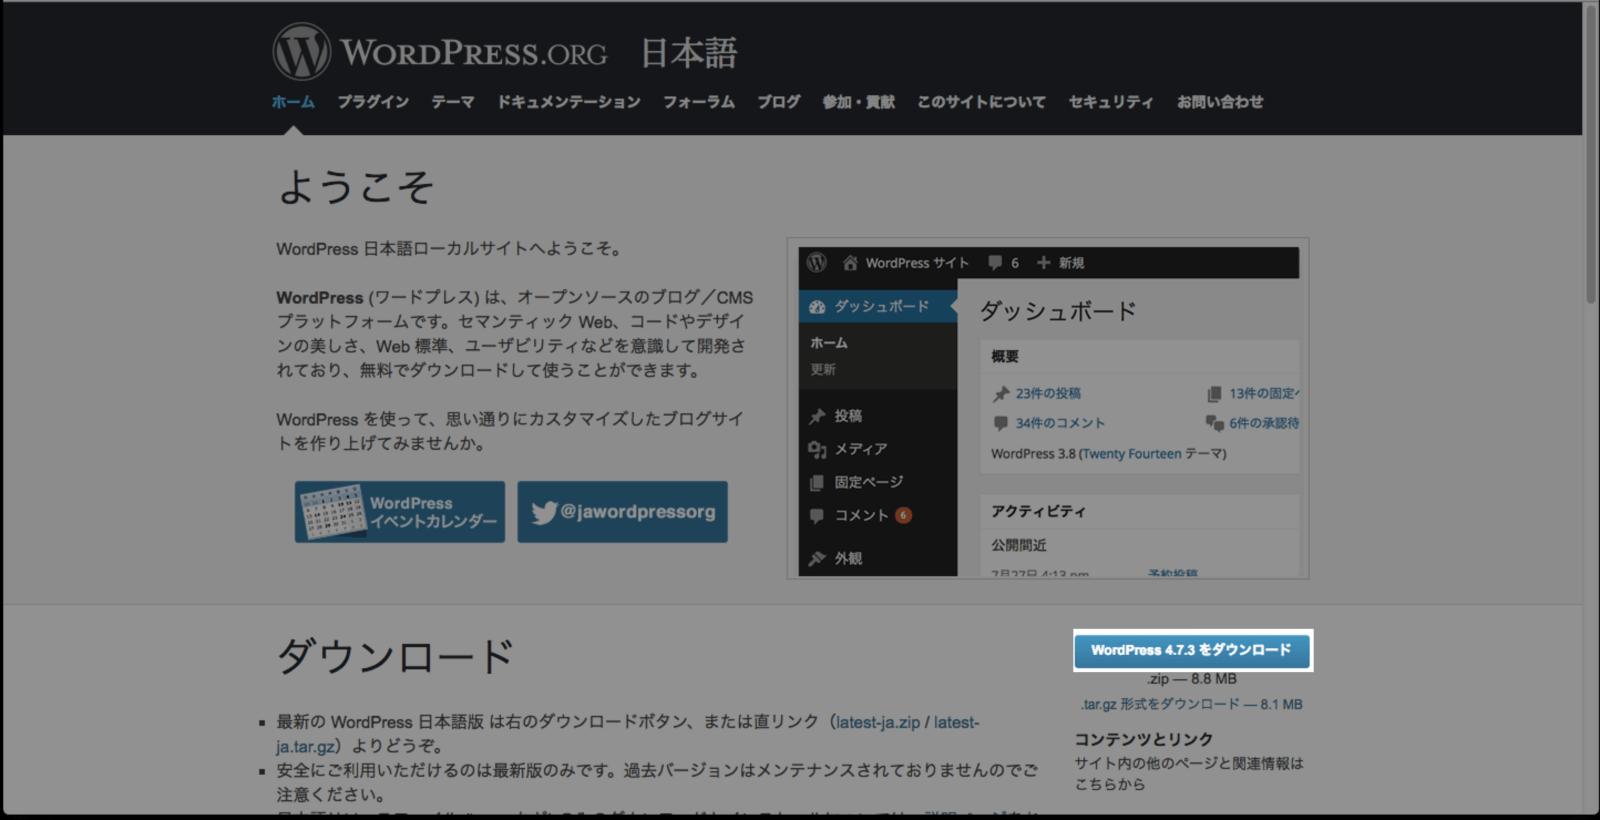 WordPress本体をダウンロードします